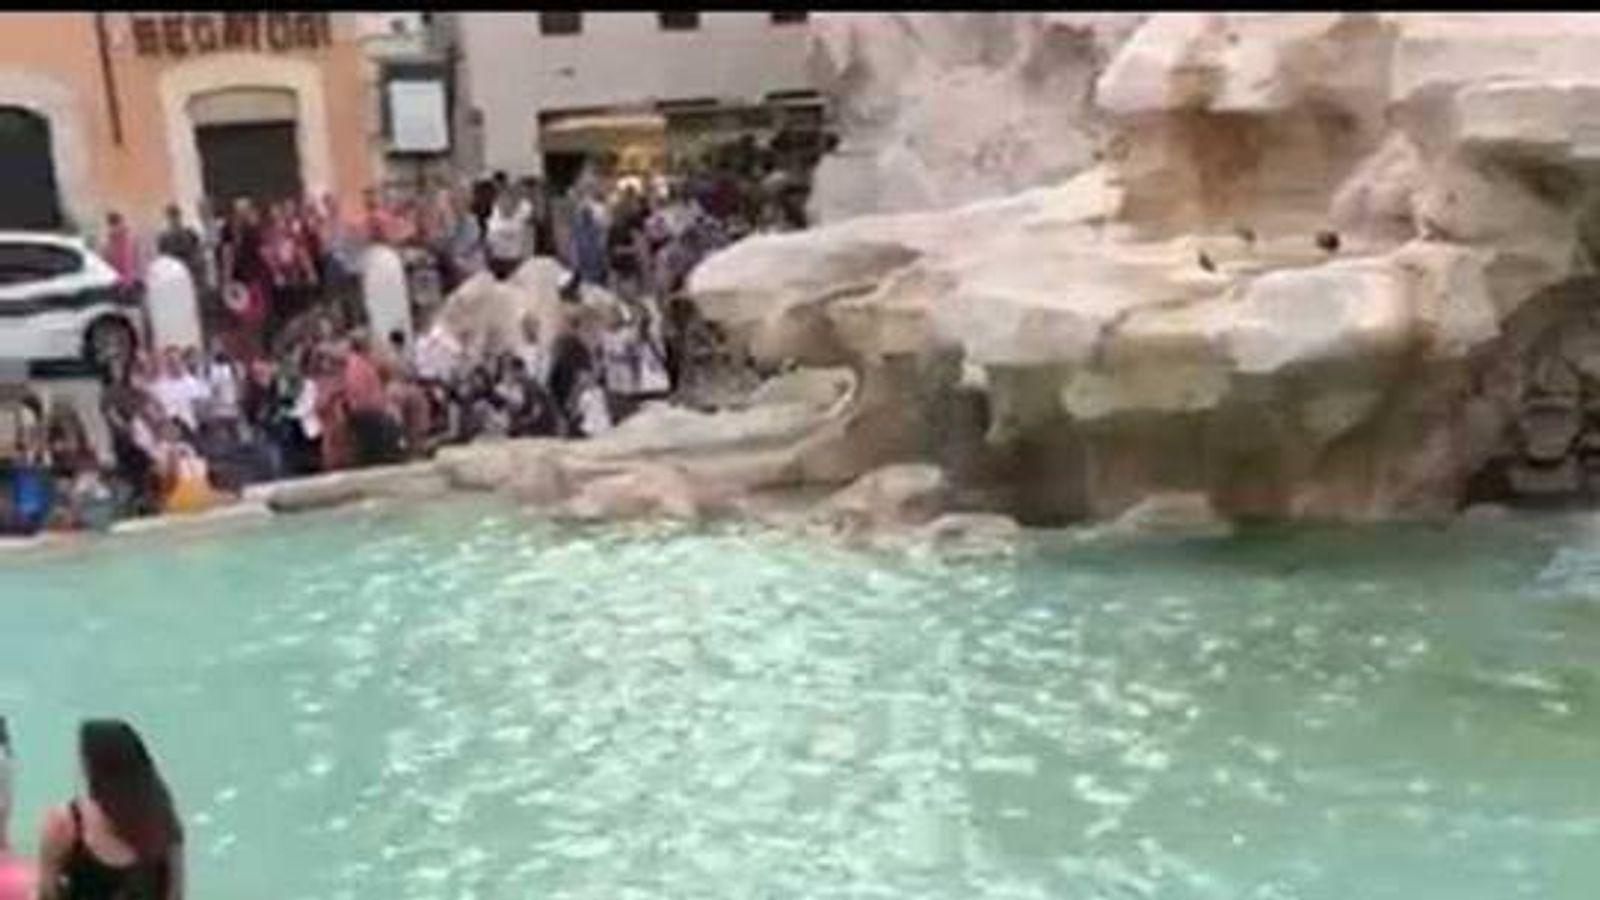 Selfie row ends in Trevi Fountain brawl